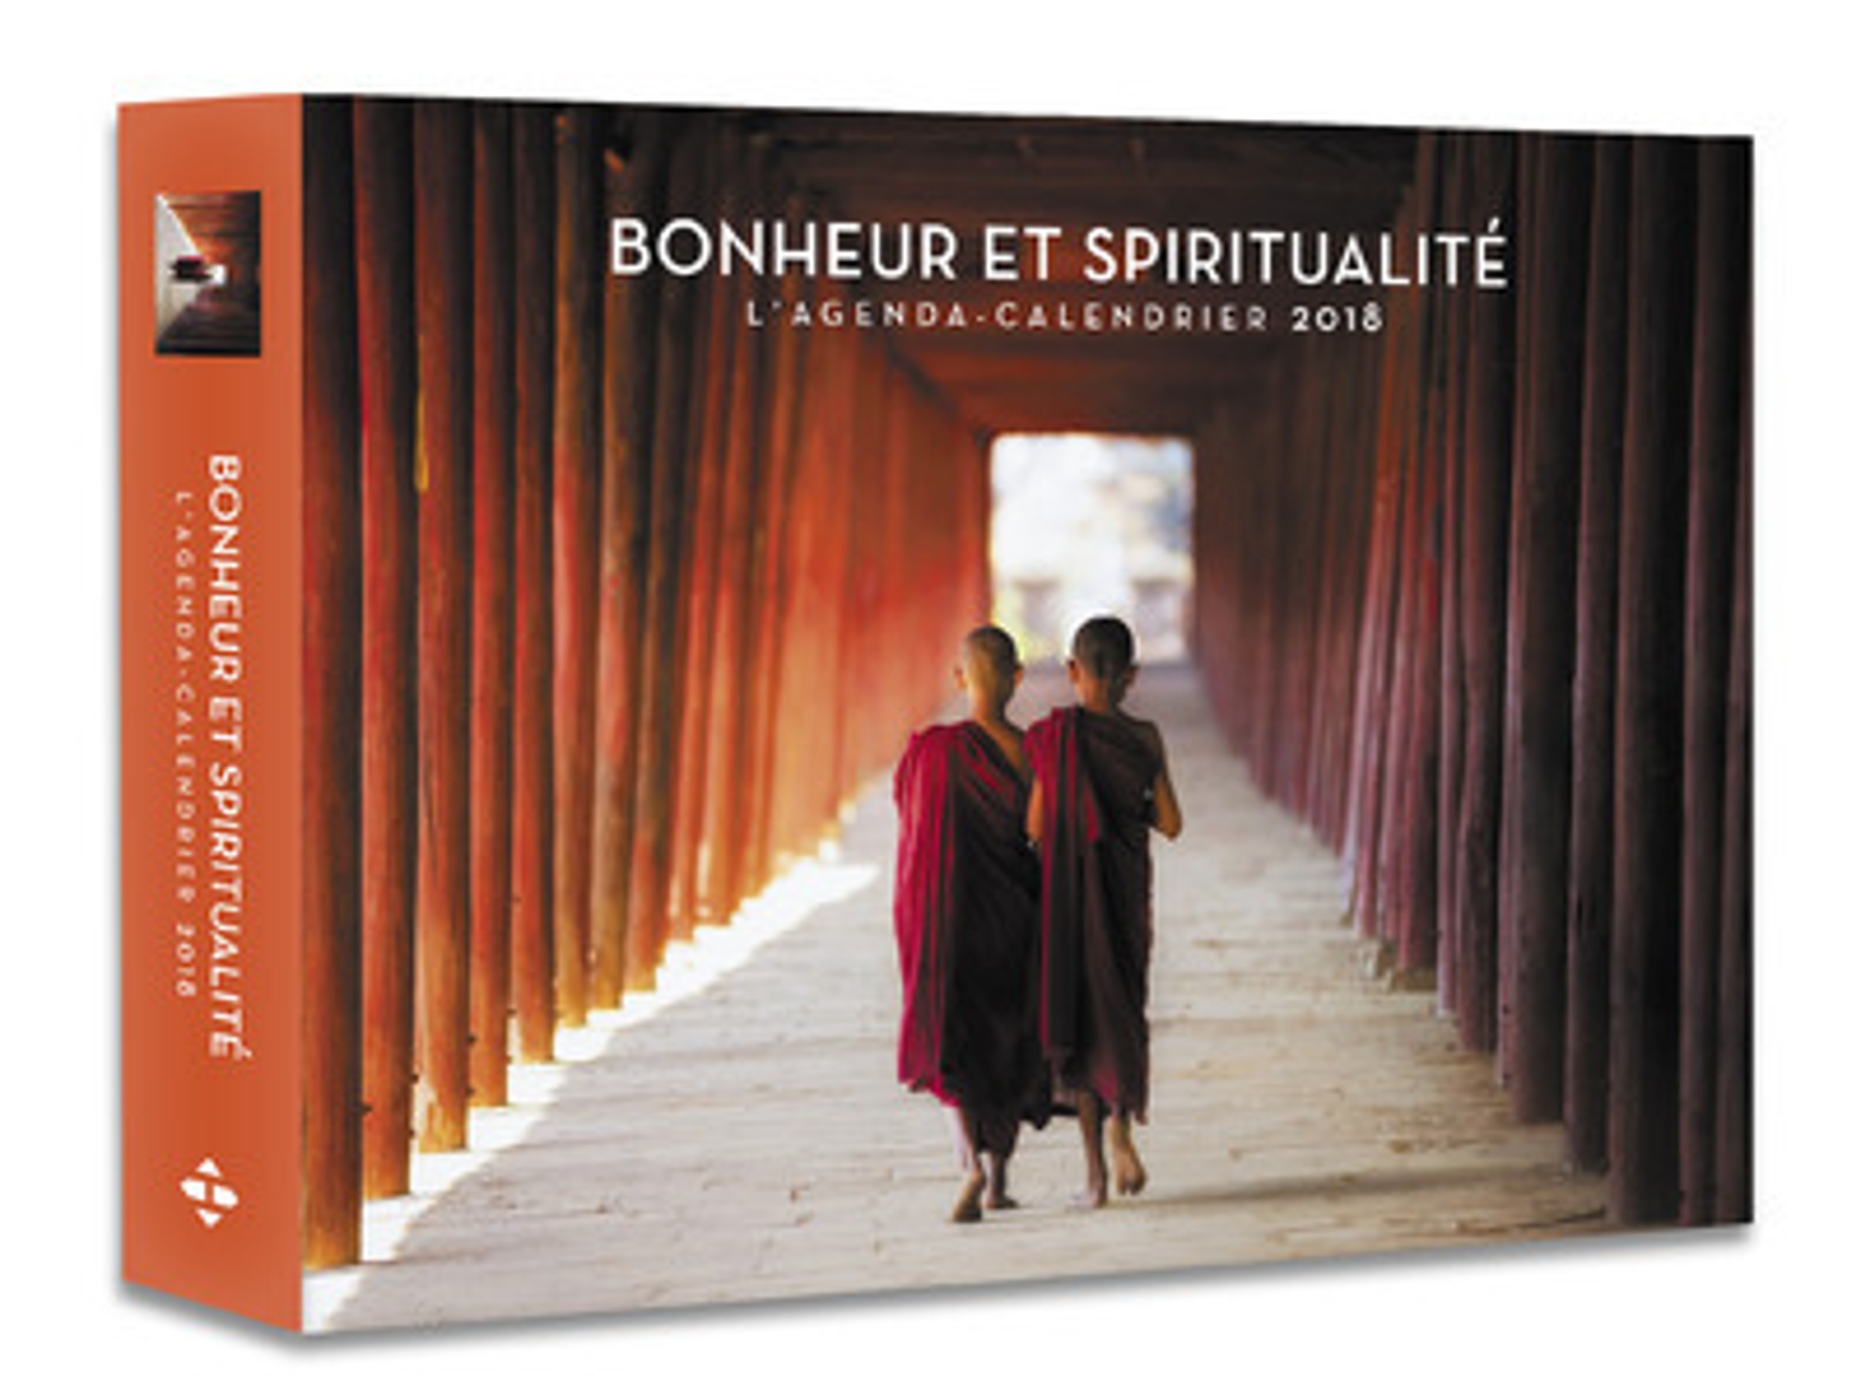 L'AGENDA-CALENDRIER BONHEUR ET SPIRITUALITE 2018